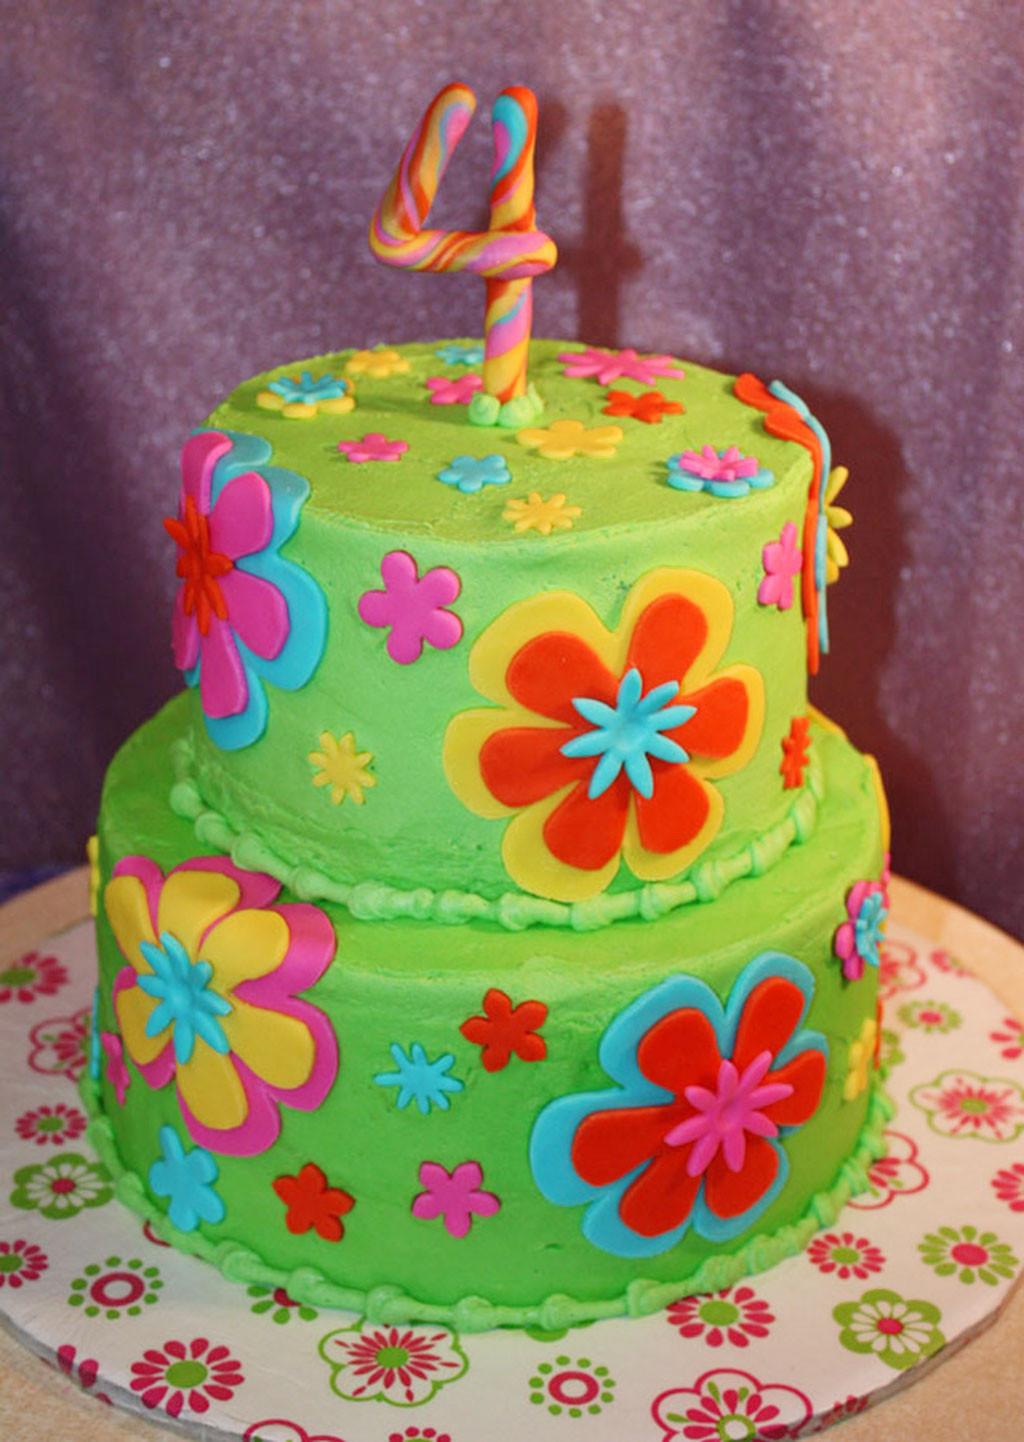 Fondant Birthday Cakes  Fondant Flowers Birthday Cakes Birthday Cake Cake Ideas